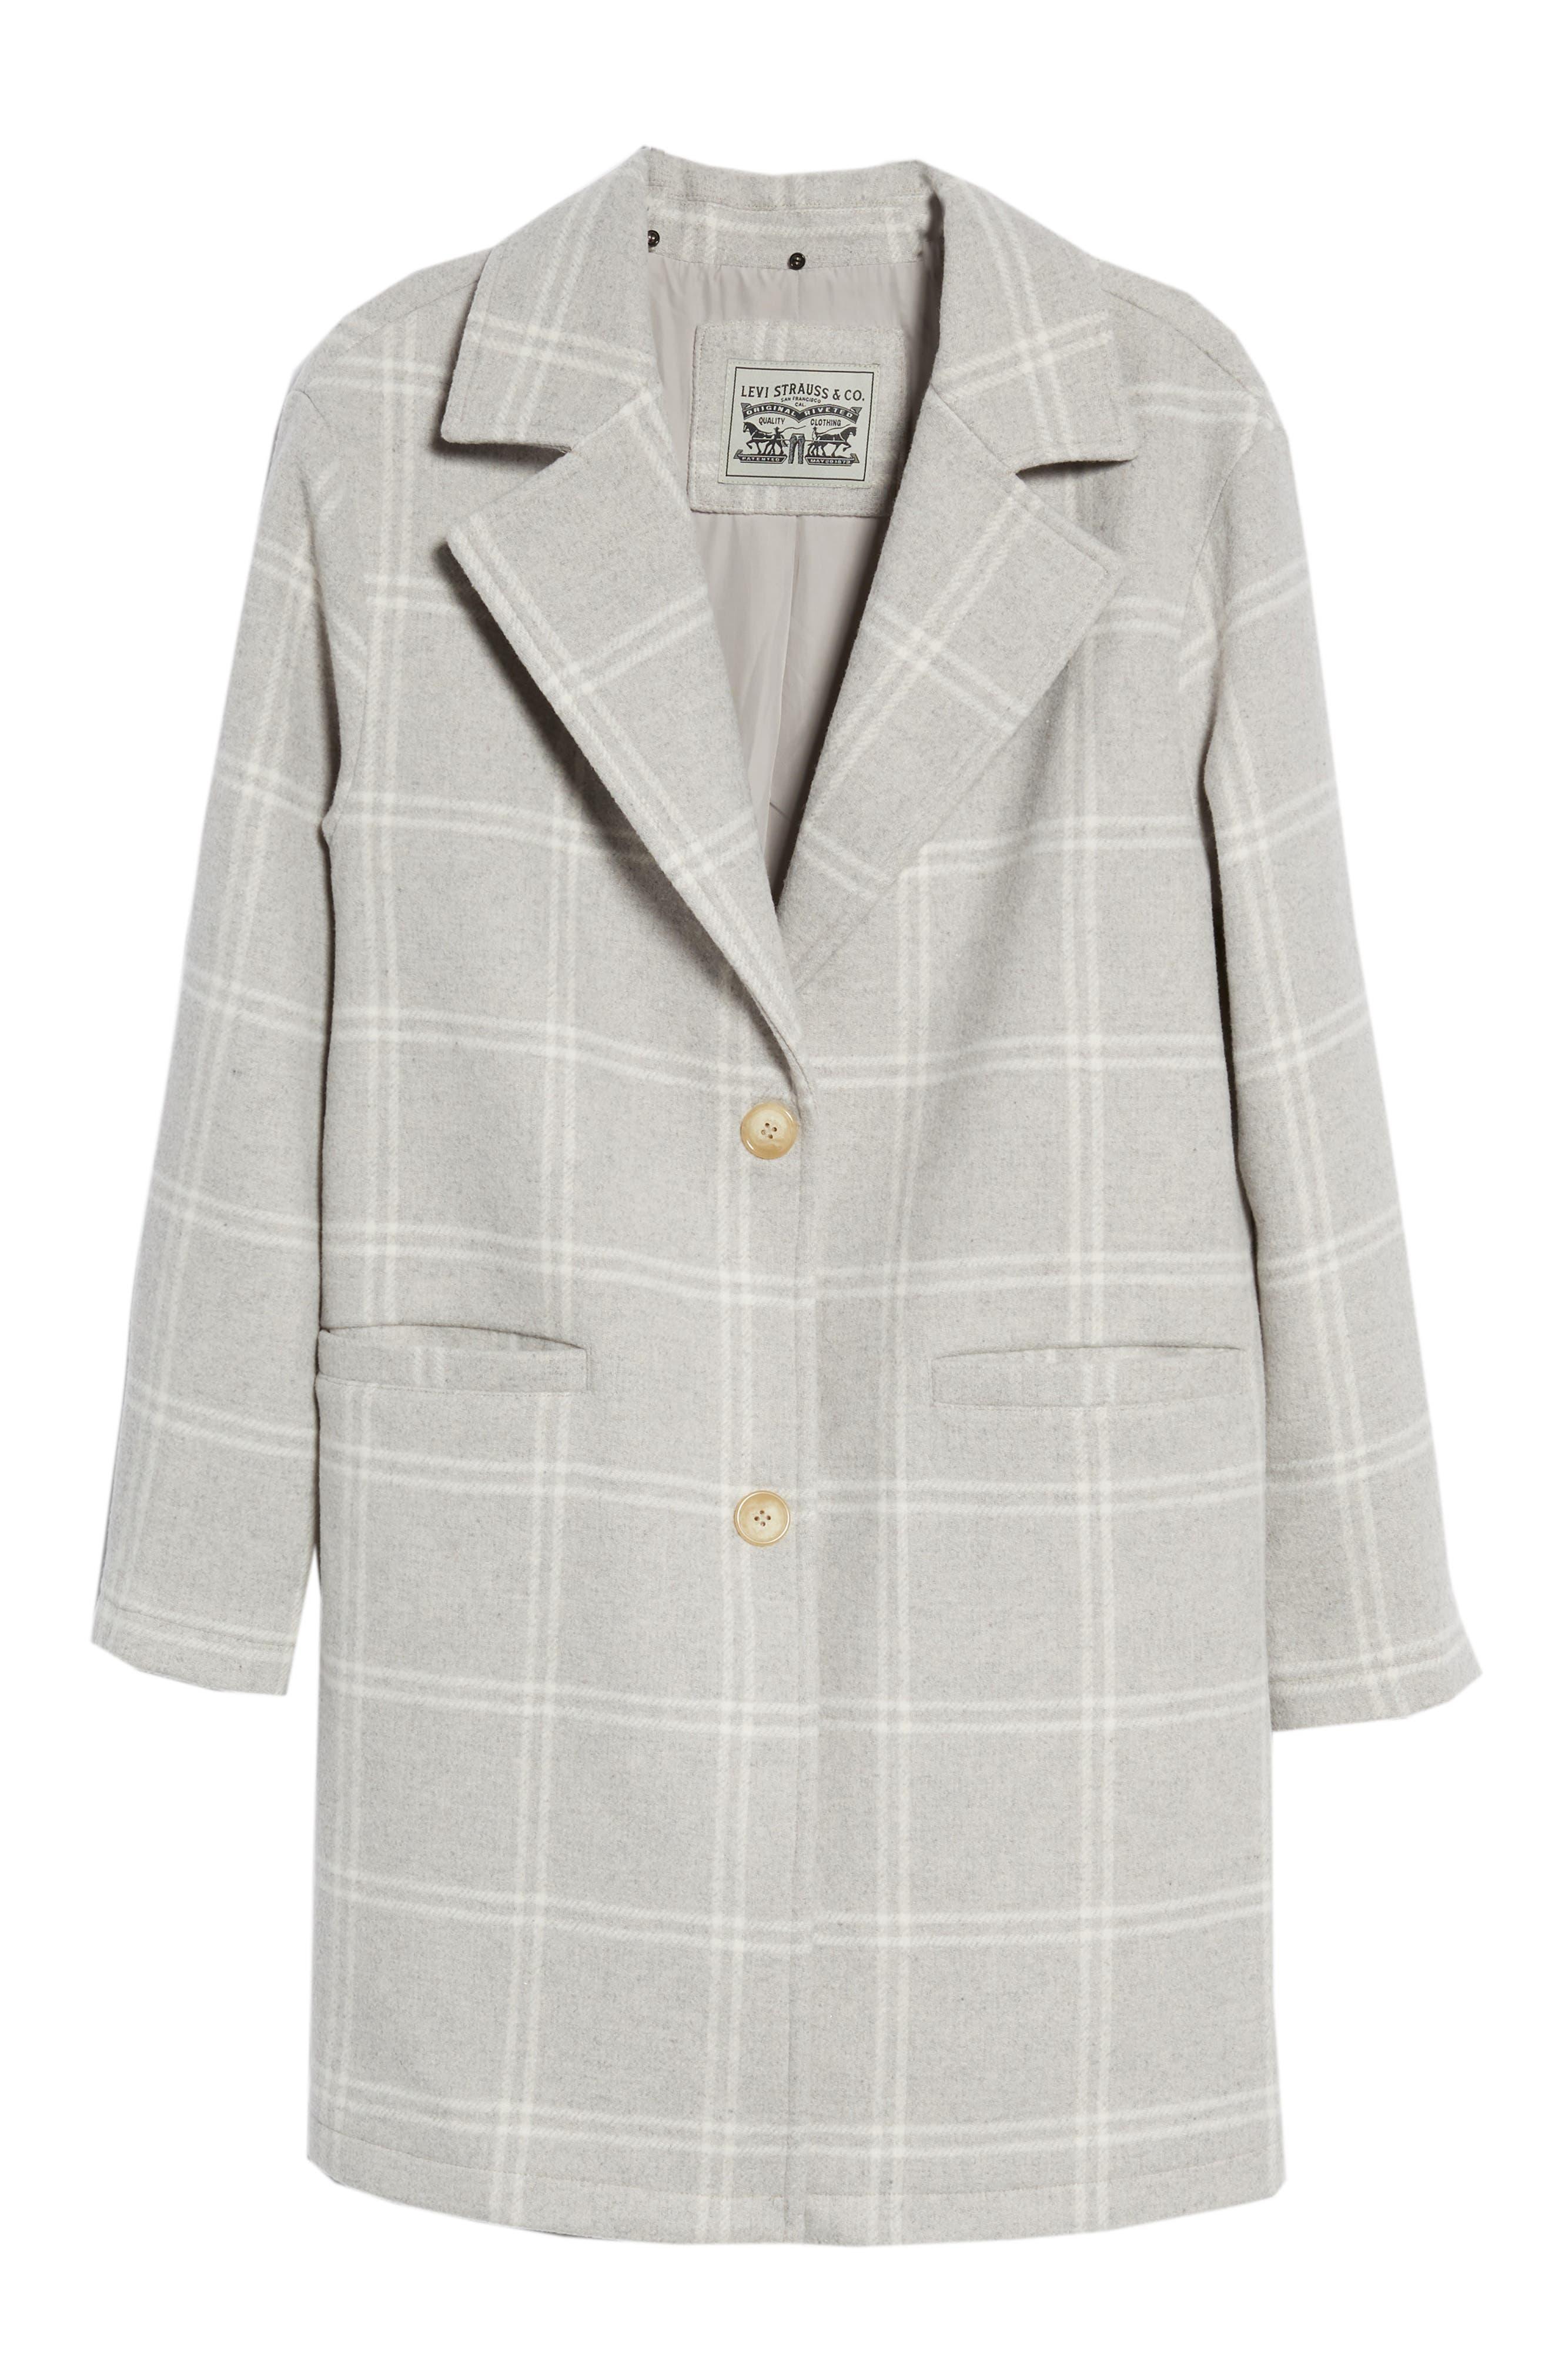 Wool Top Coat,                             Alternate thumbnail 6, color,                             GREY PLAID WOOL